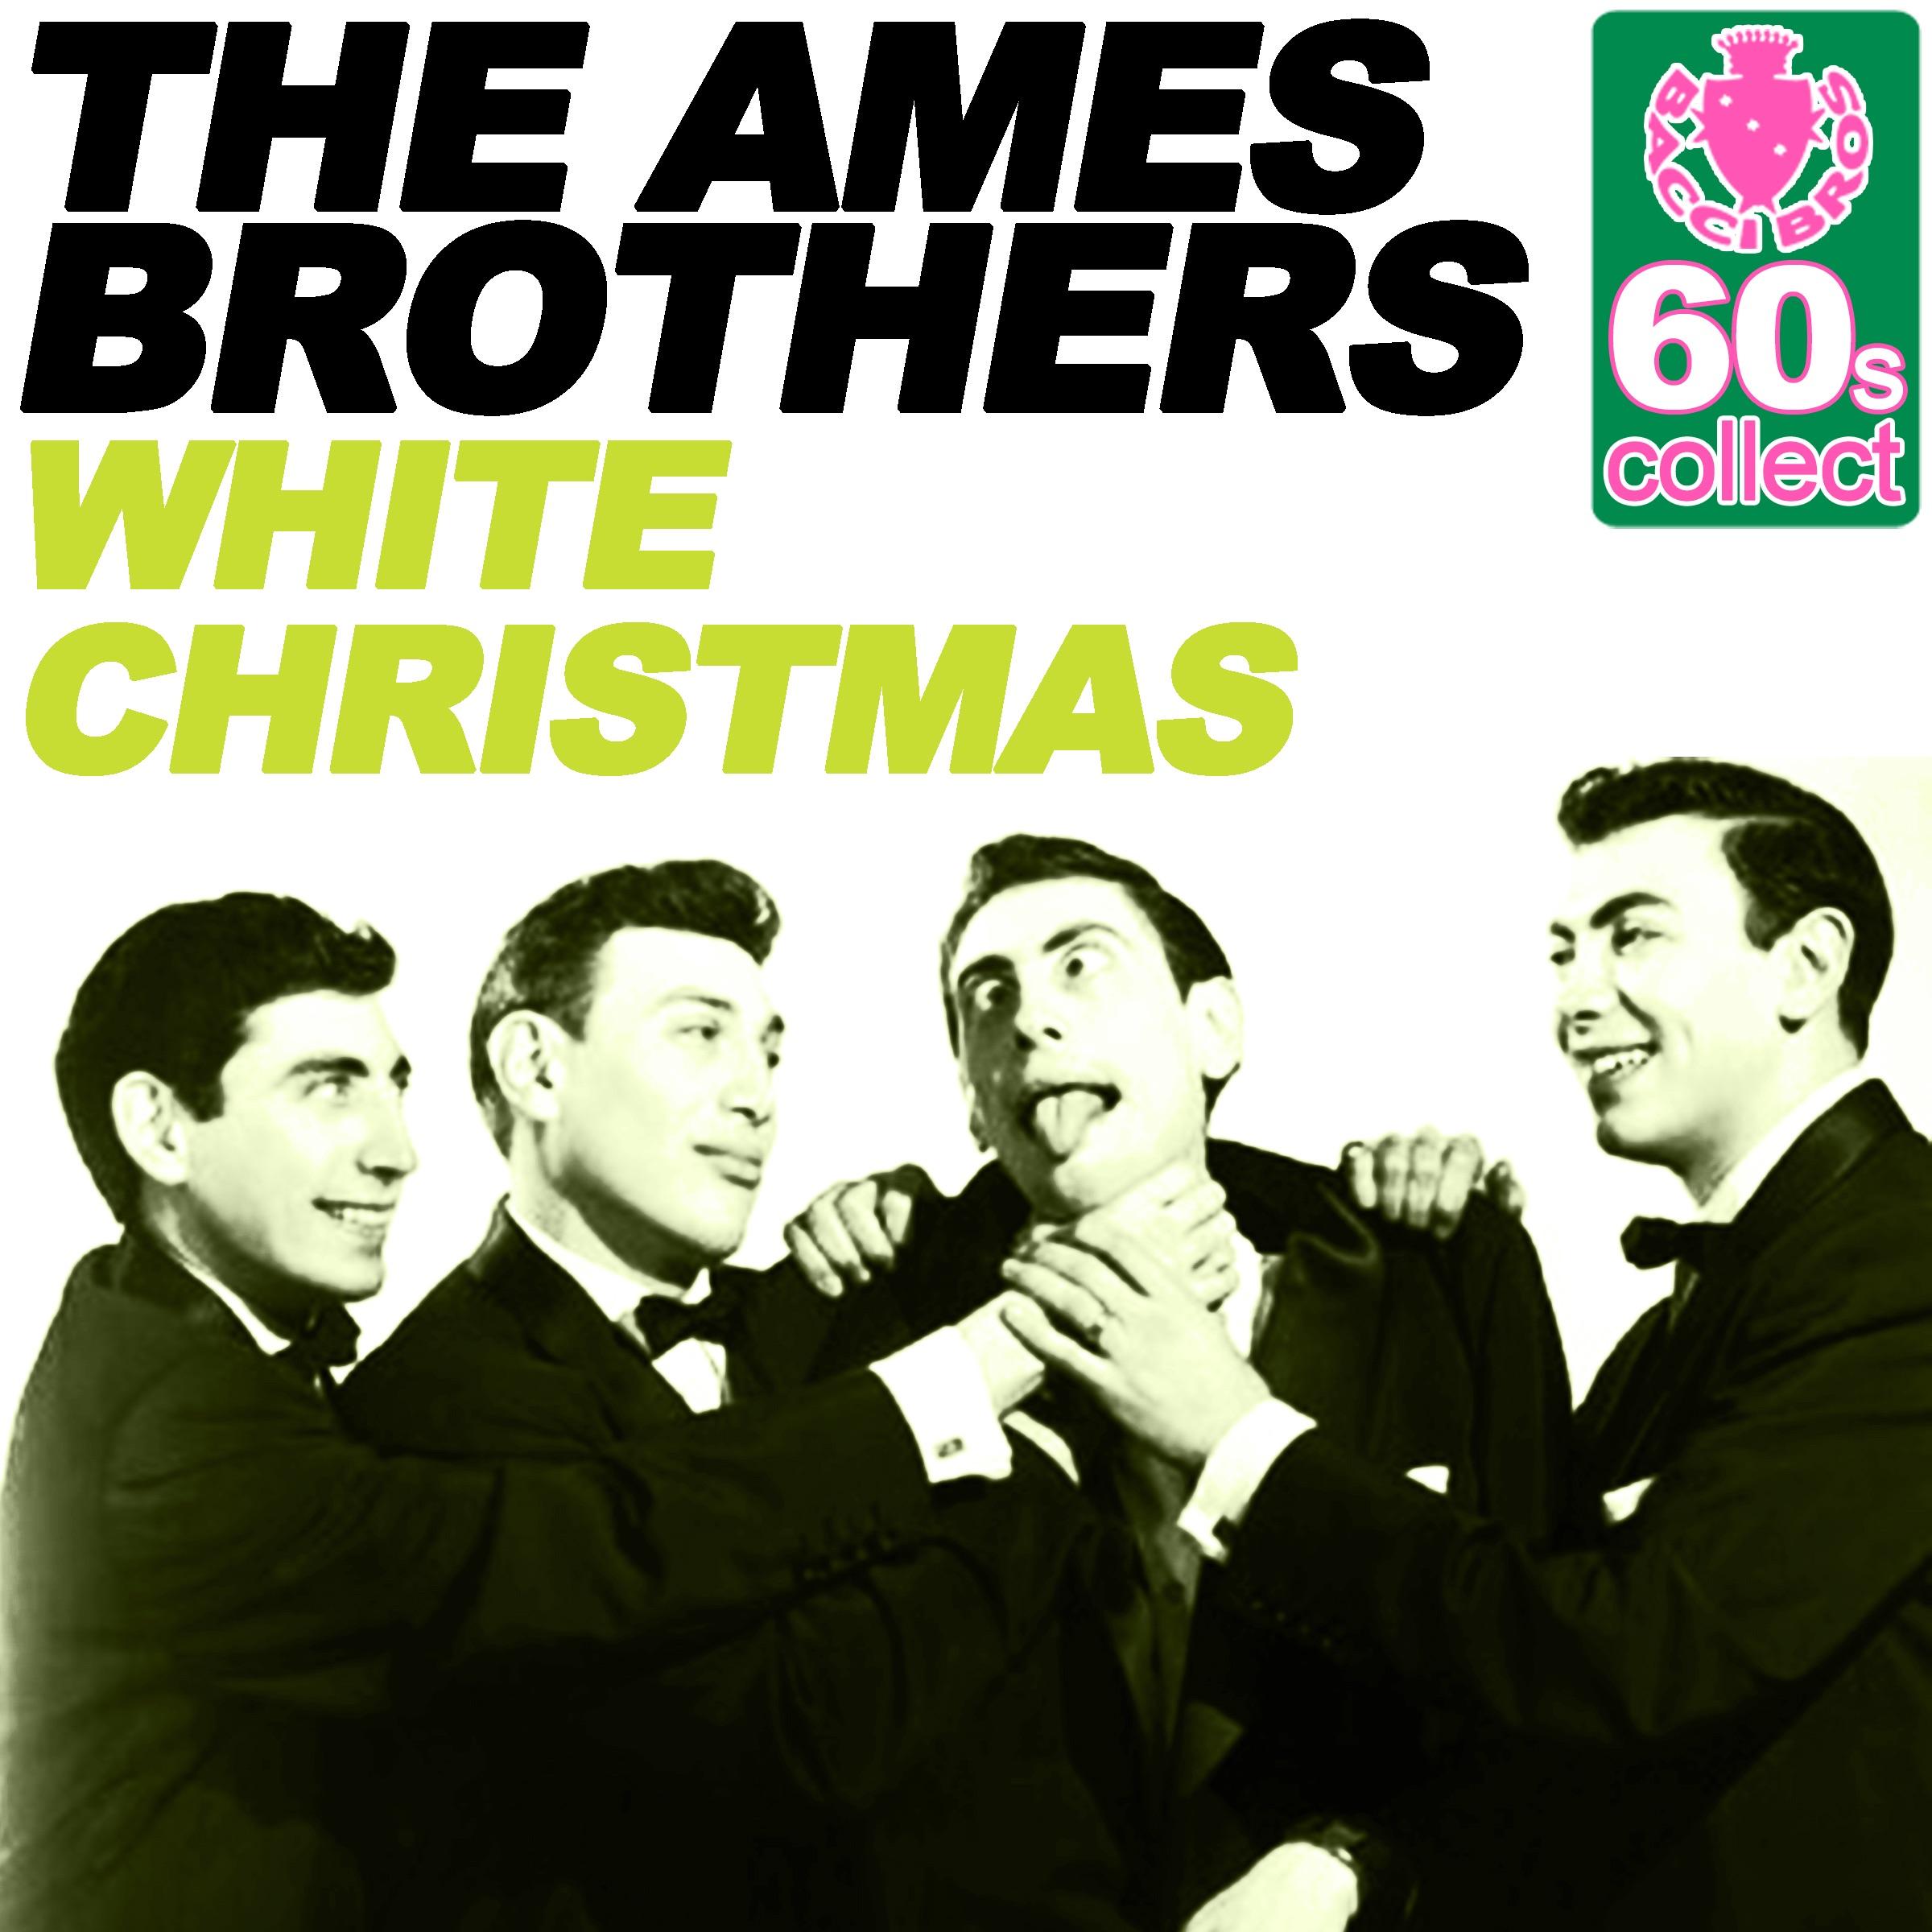 White Christmas (Remastered) - Single